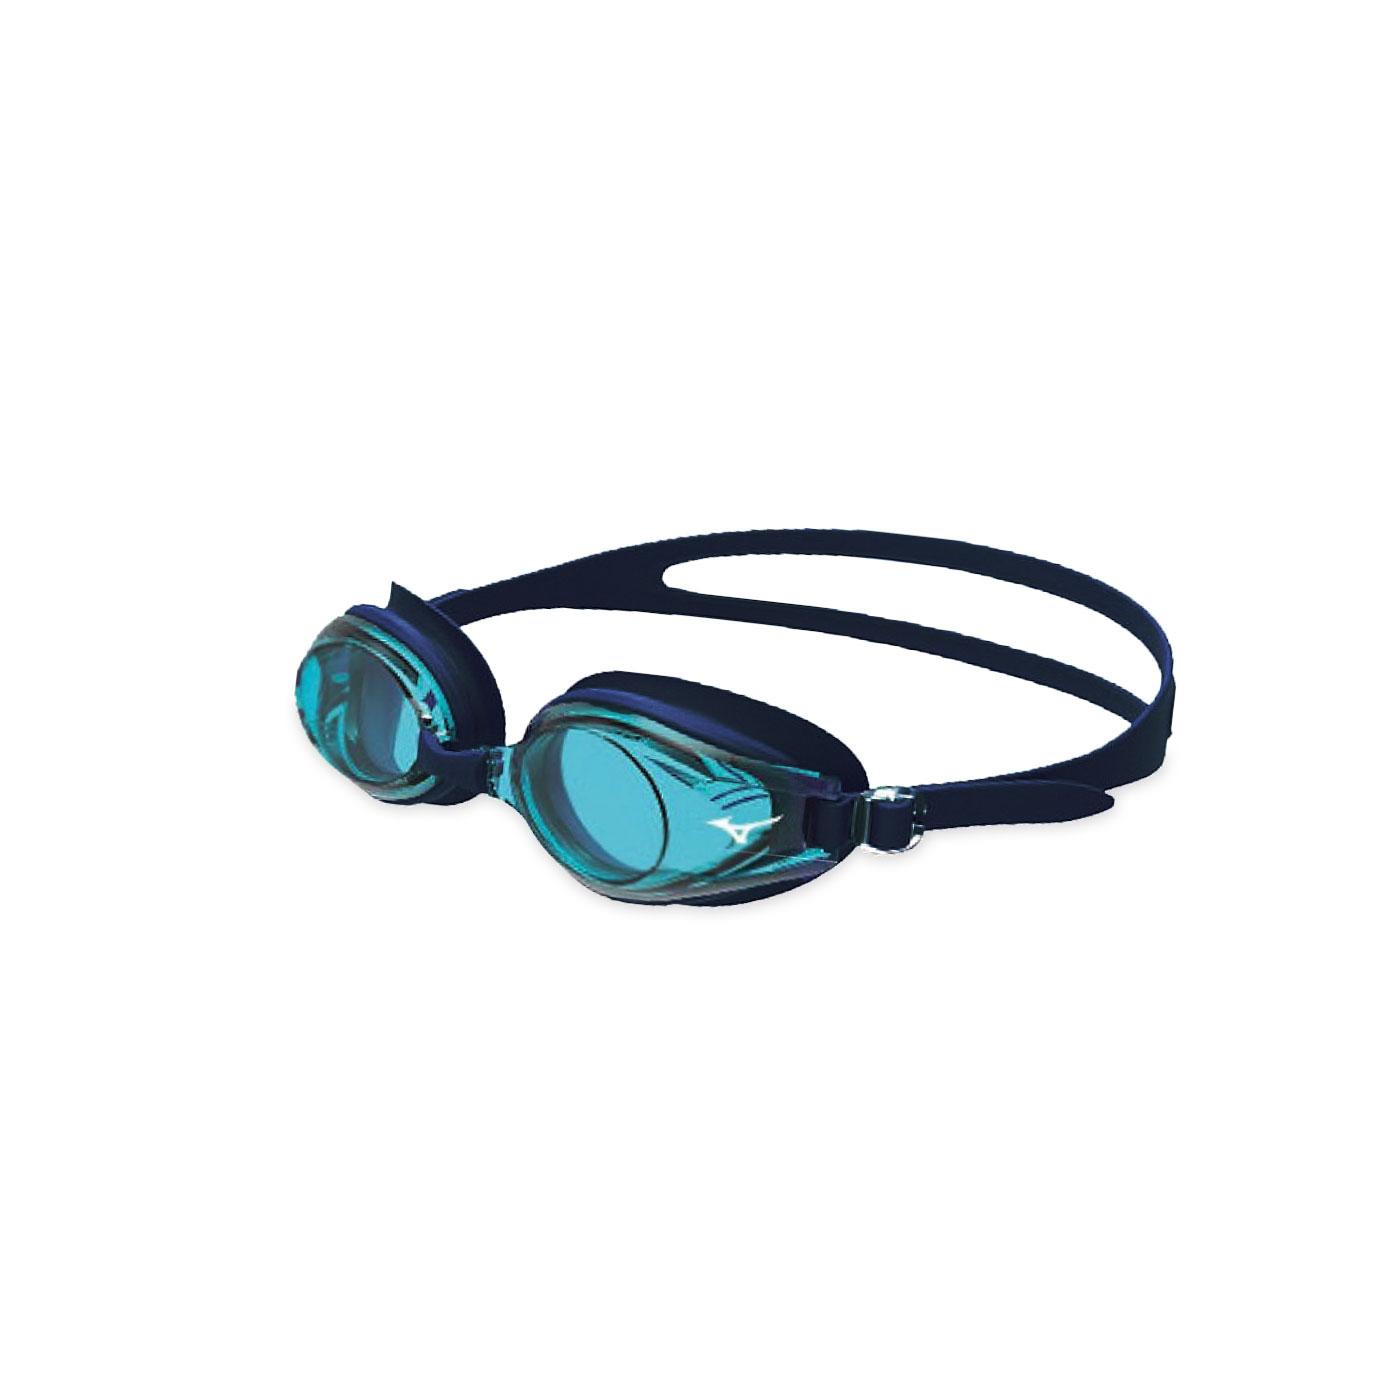 MIZUNO 日製-健康型墊片泳鏡  SWIMN3JE601000-09 - 水藍黑